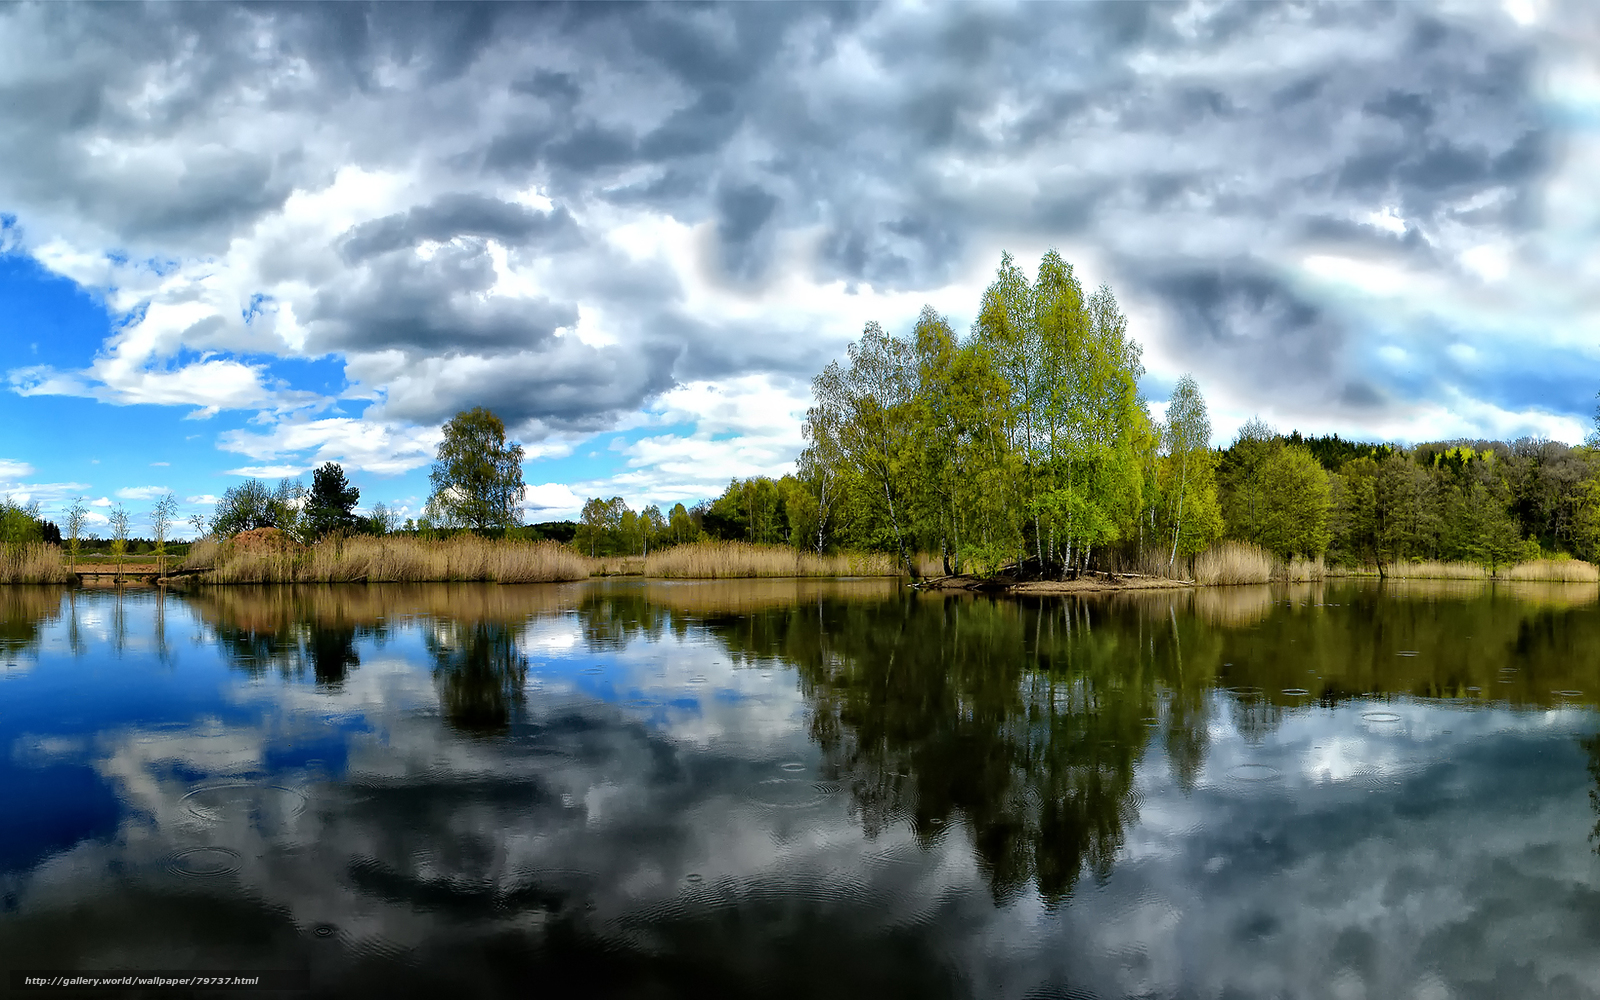 Hq paisajes de agua papel pintado derbe belleza hermoso - Papel pintado paisajes ...